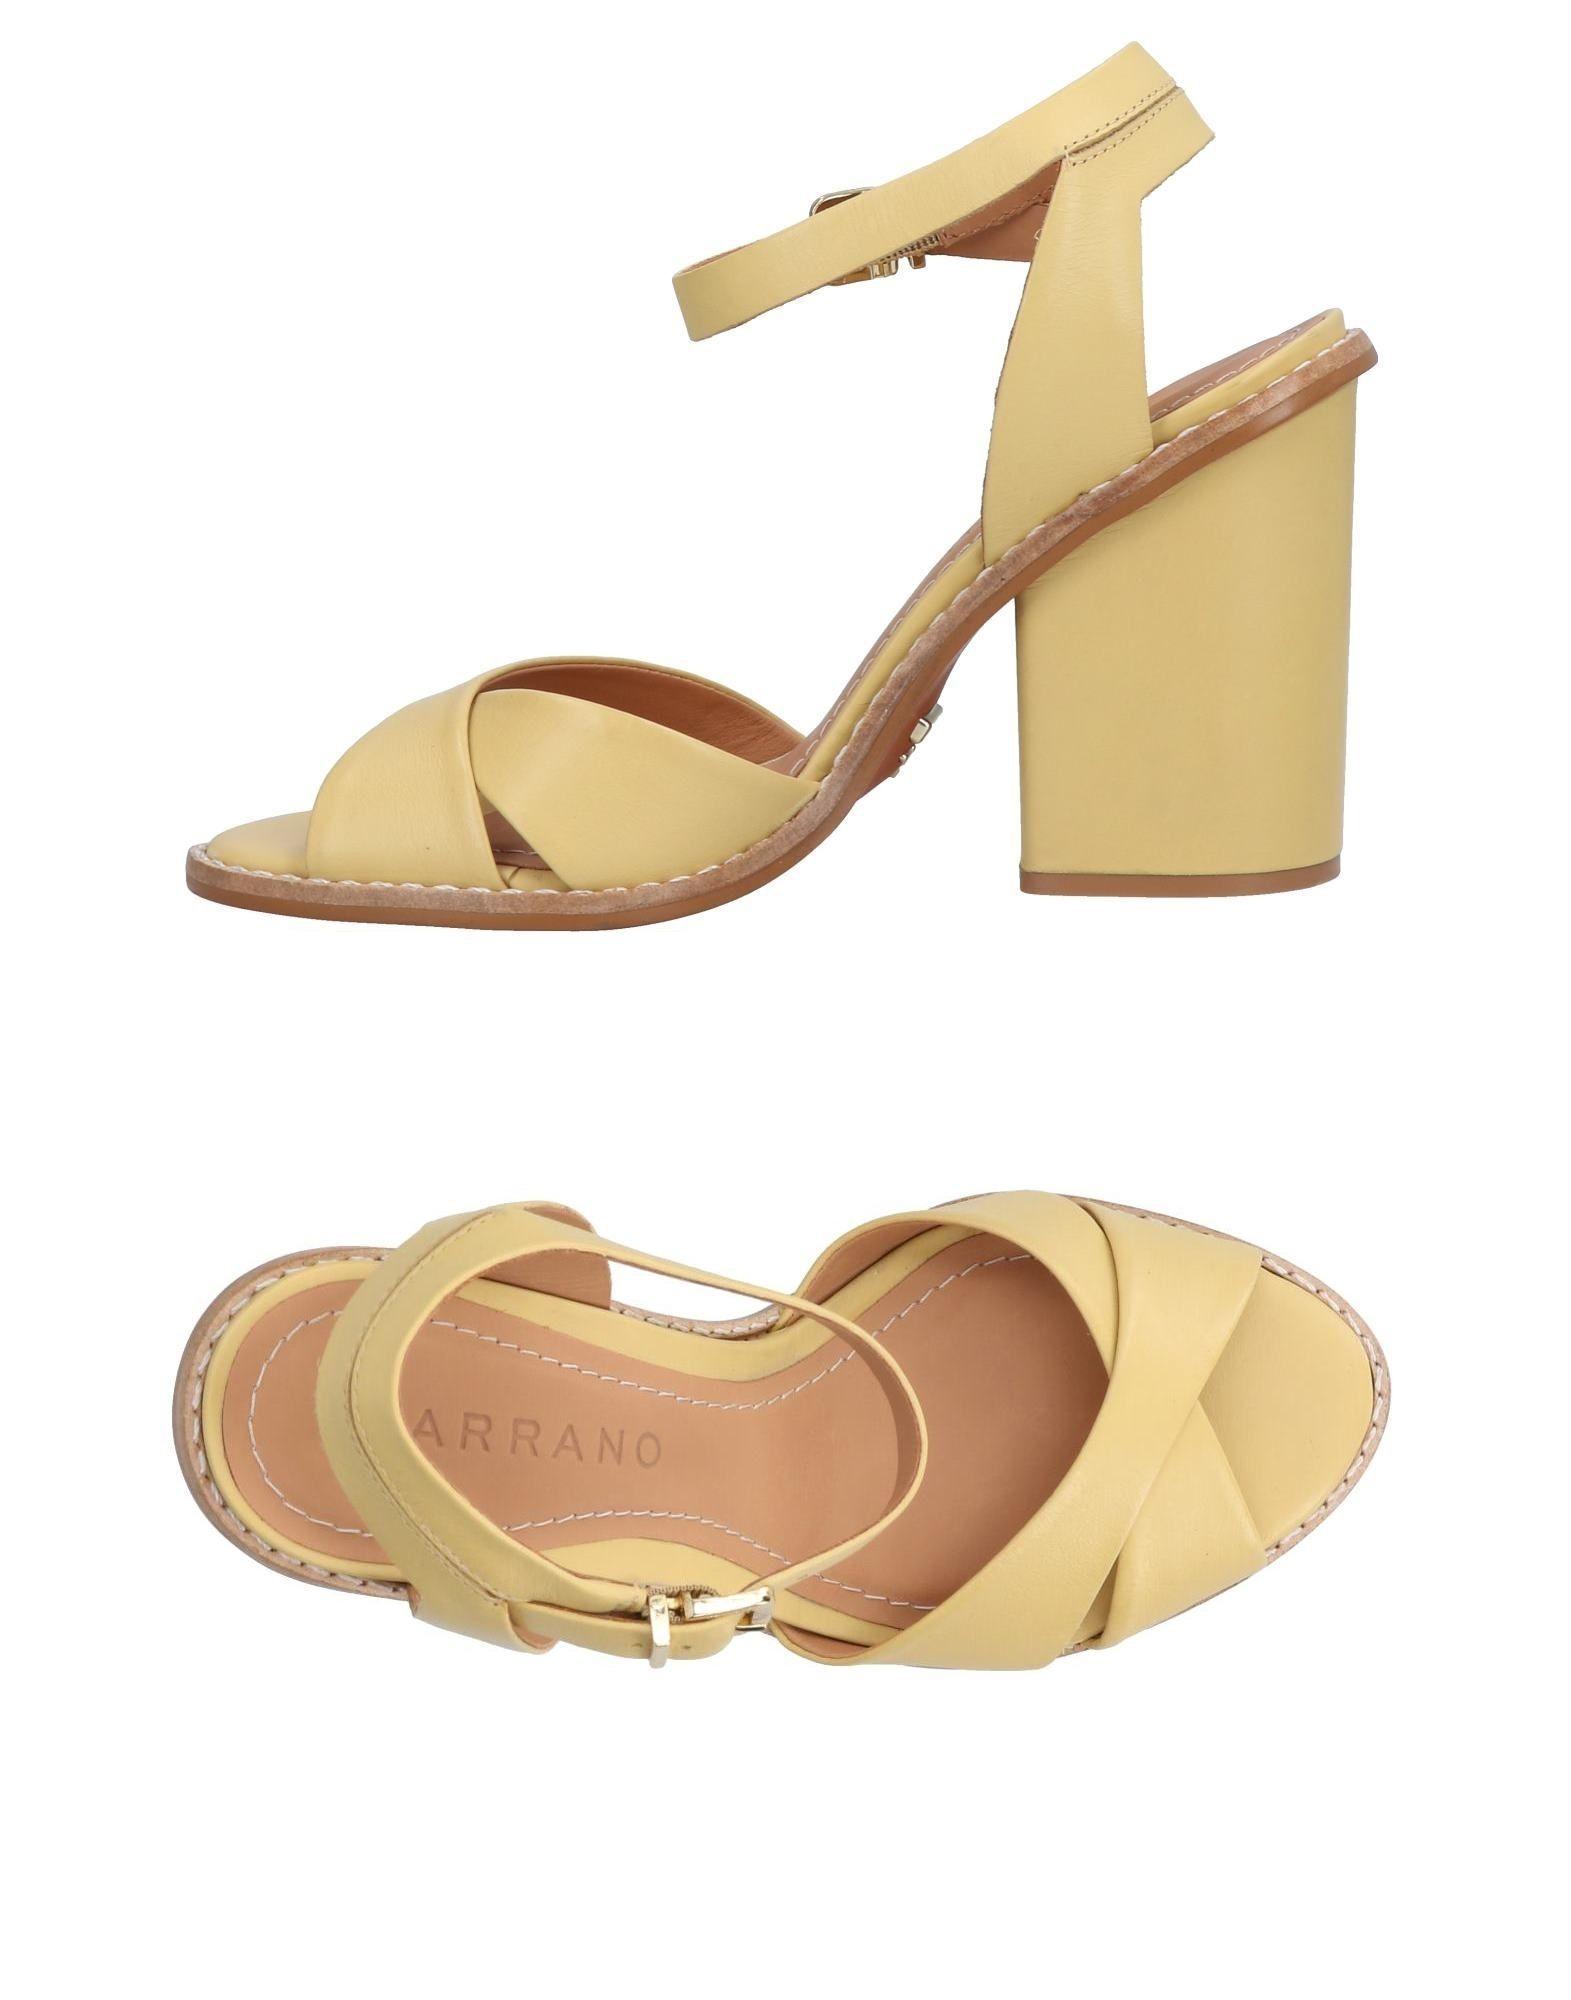 Carrano Sandalen Damen  11447353PM Gute Qualität beliebte Schuhe